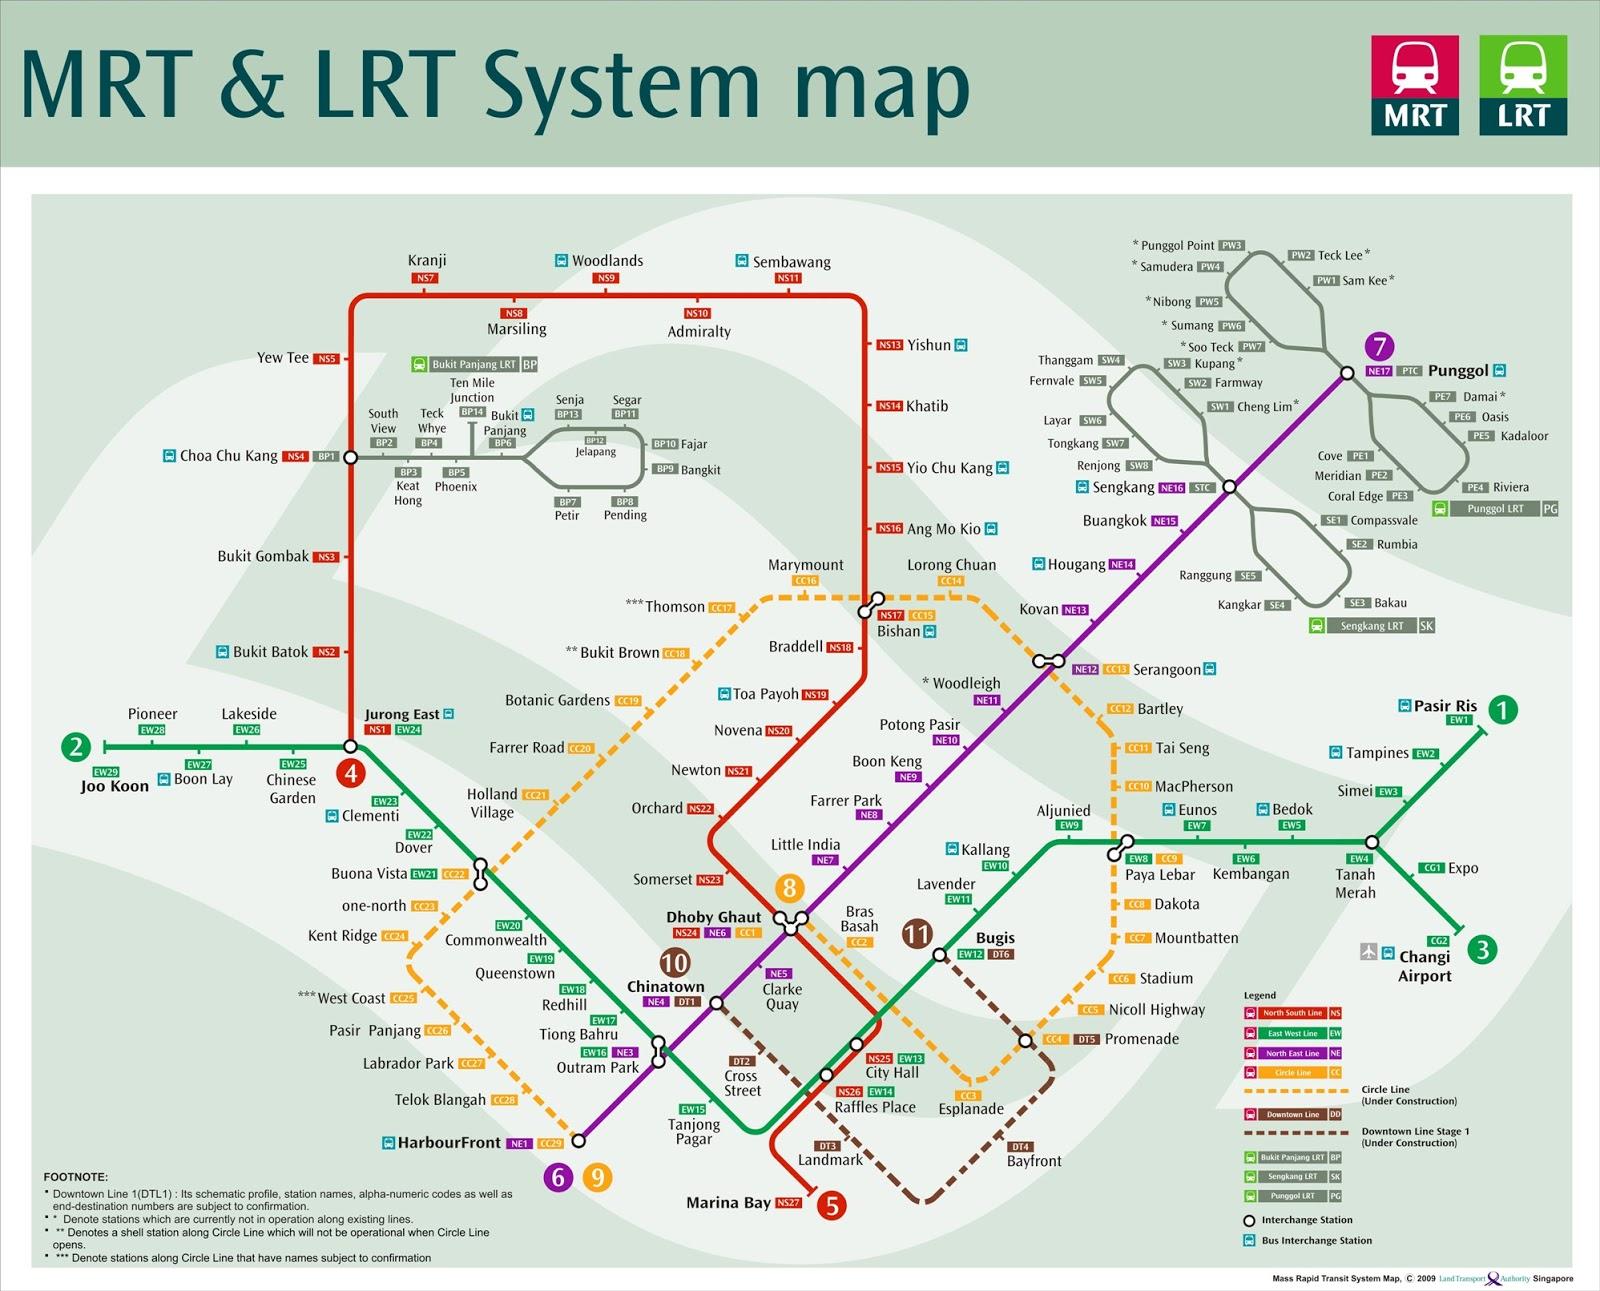 Hotel-hotel yang dekat MRT Stations di Singapura   Jalan